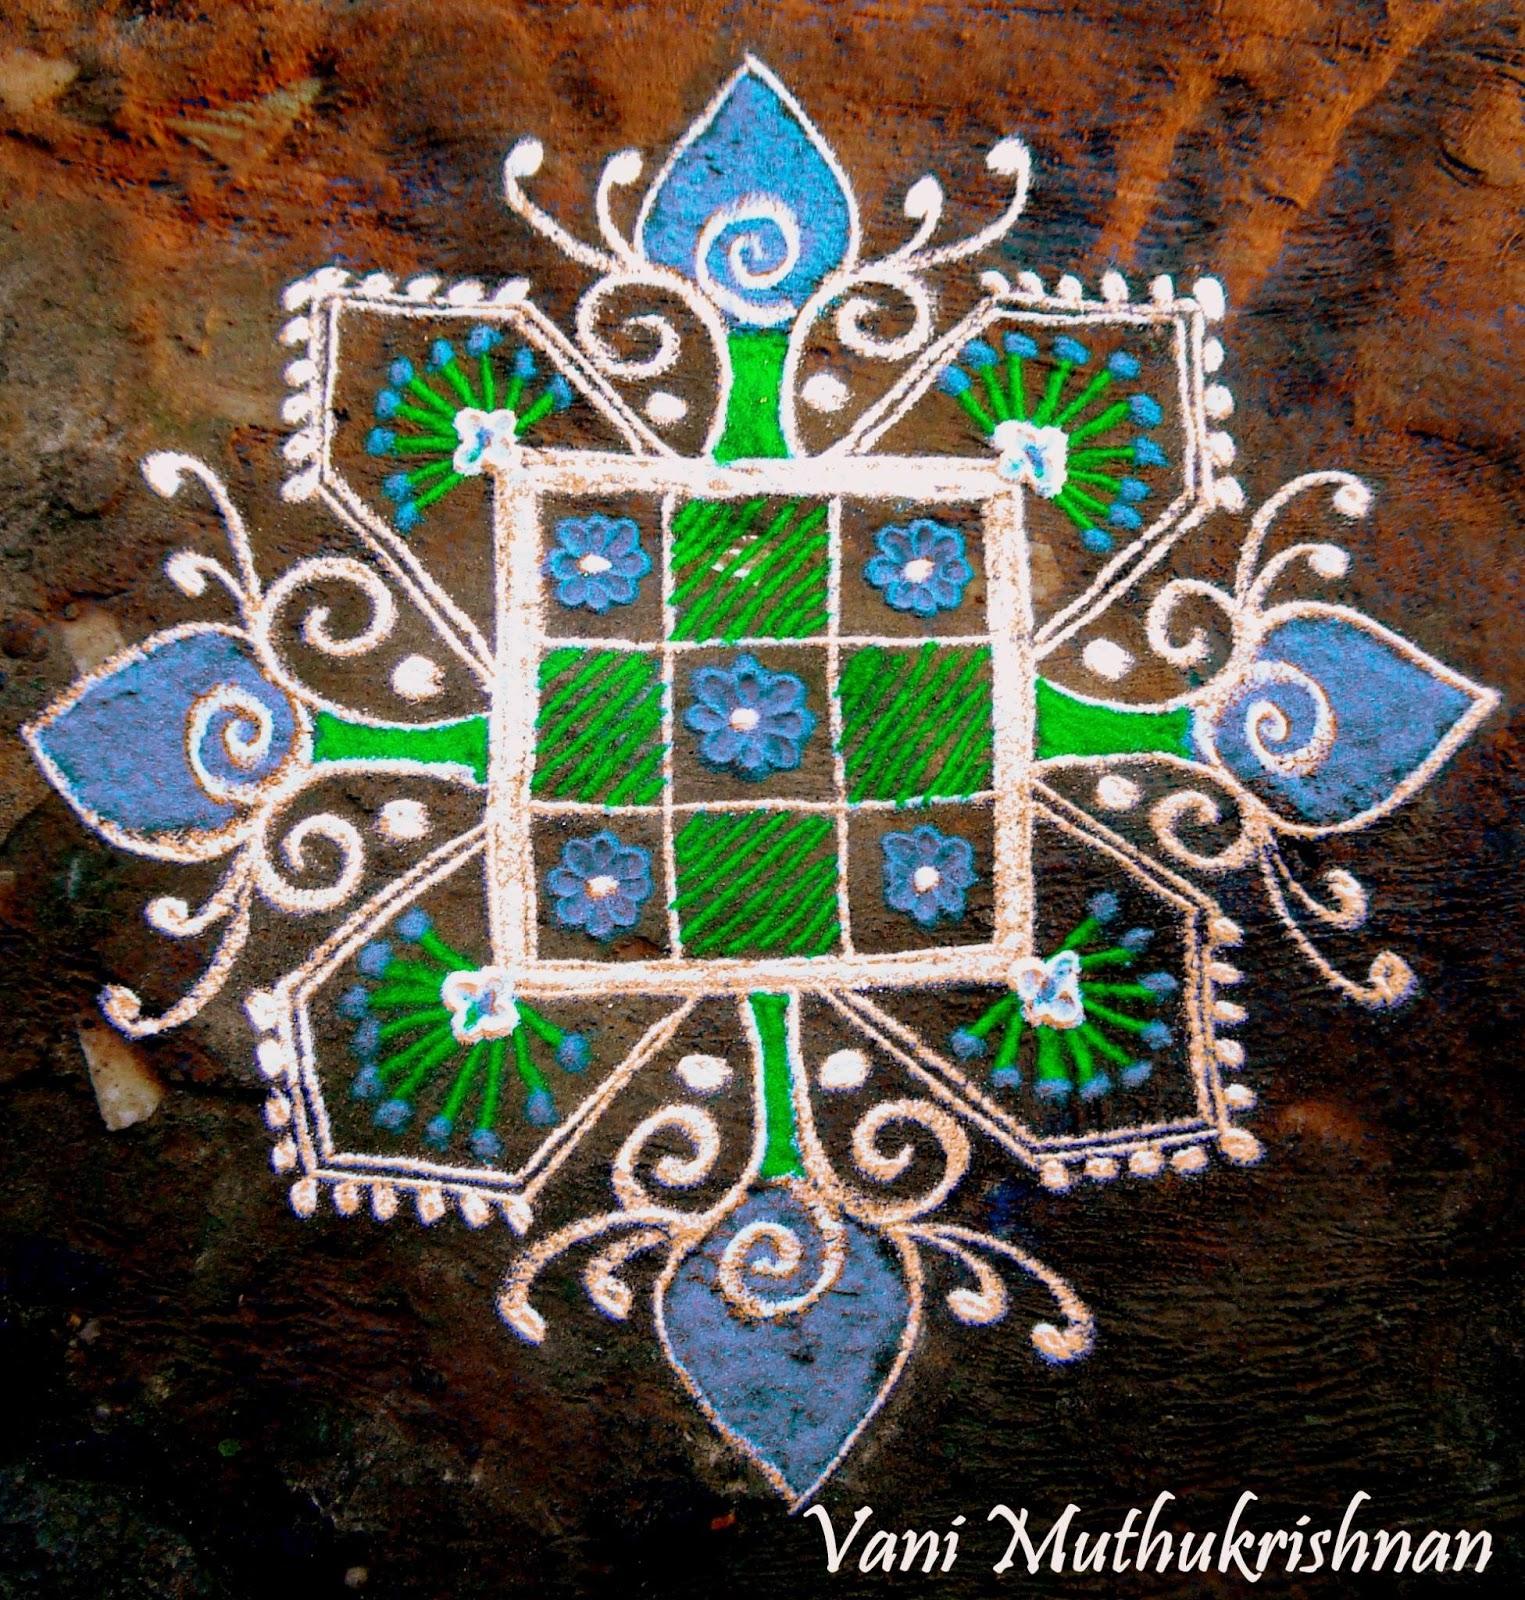 Kolam Designs 9